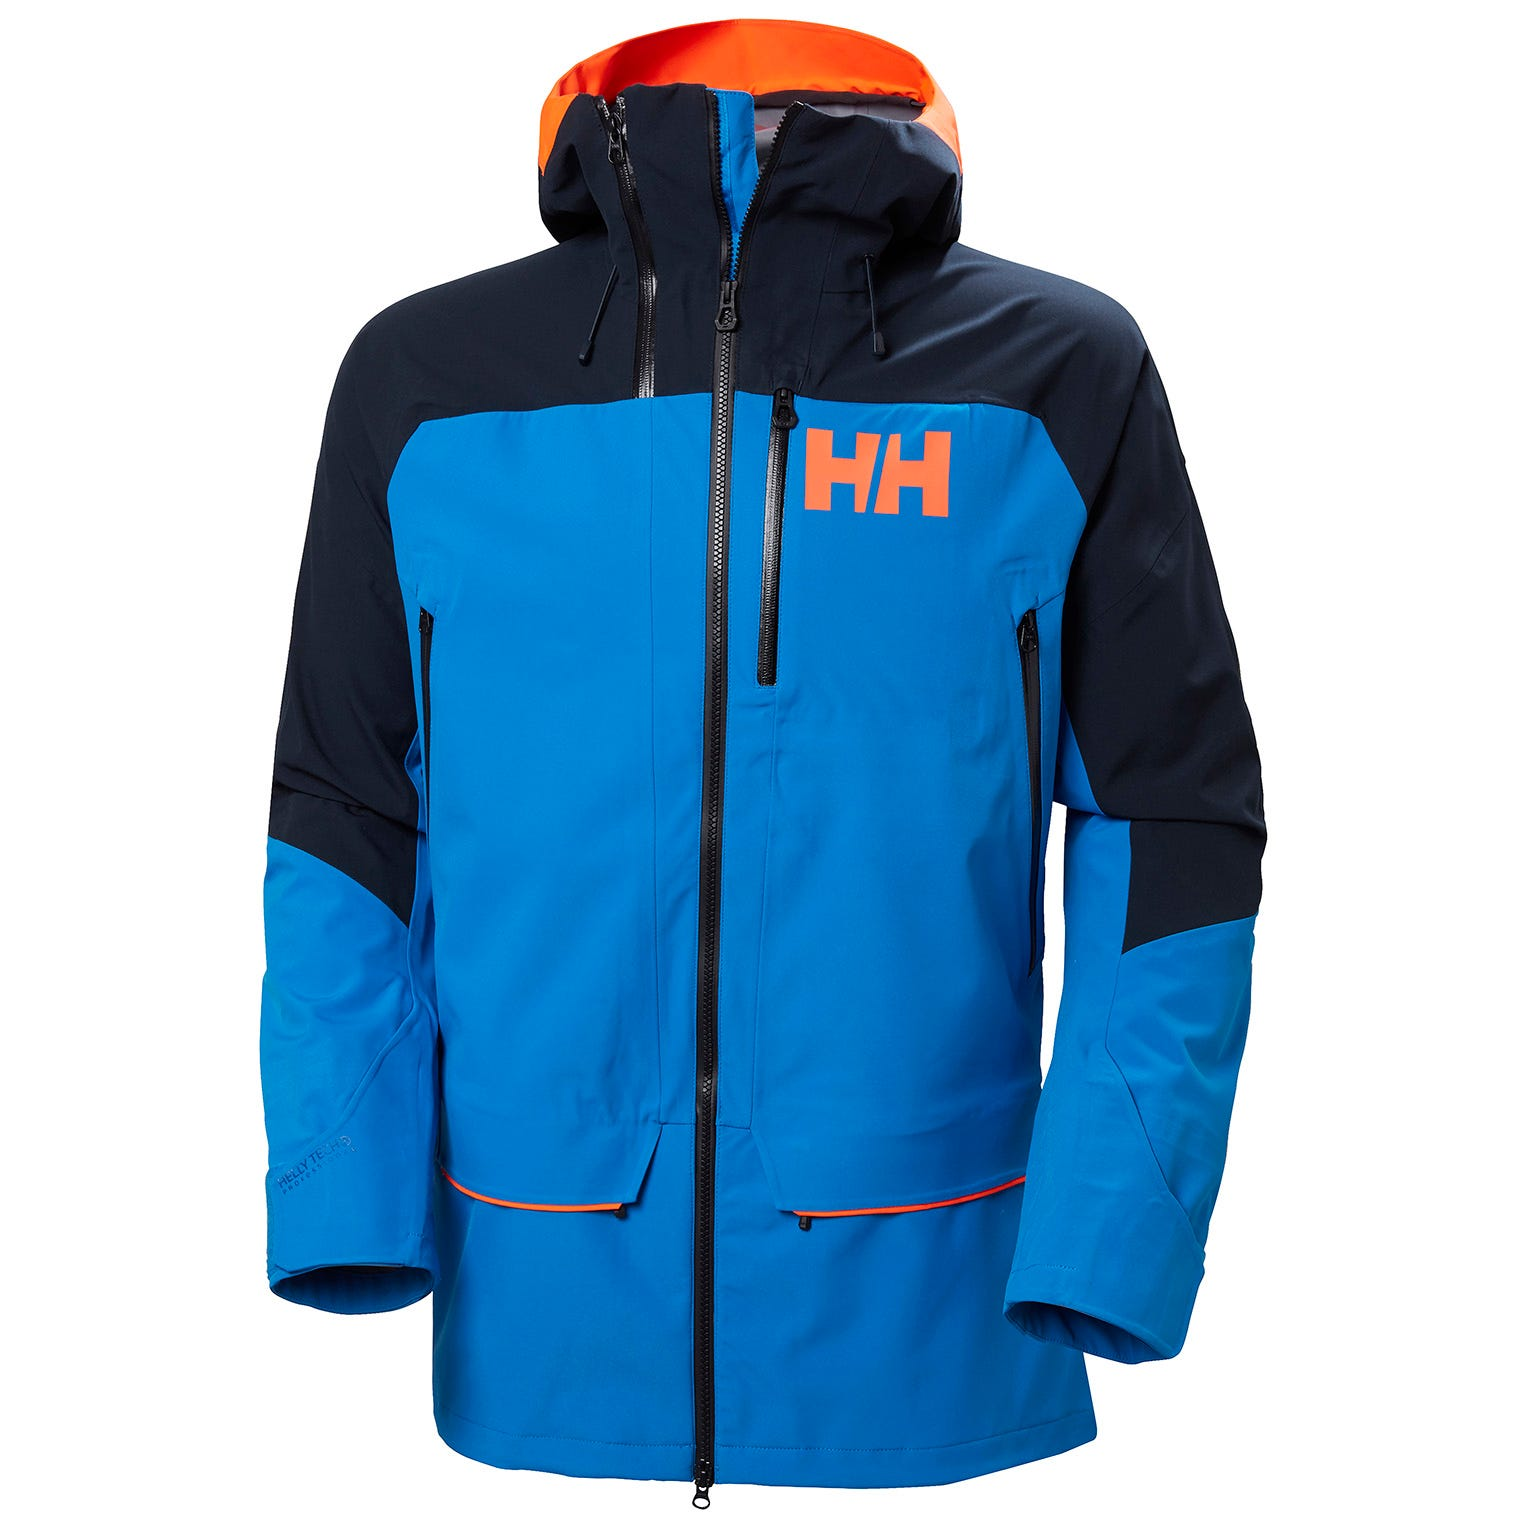 Mens Ridge Shell 2.0 Jacket | Uk Helly Hansen Mens Blue M